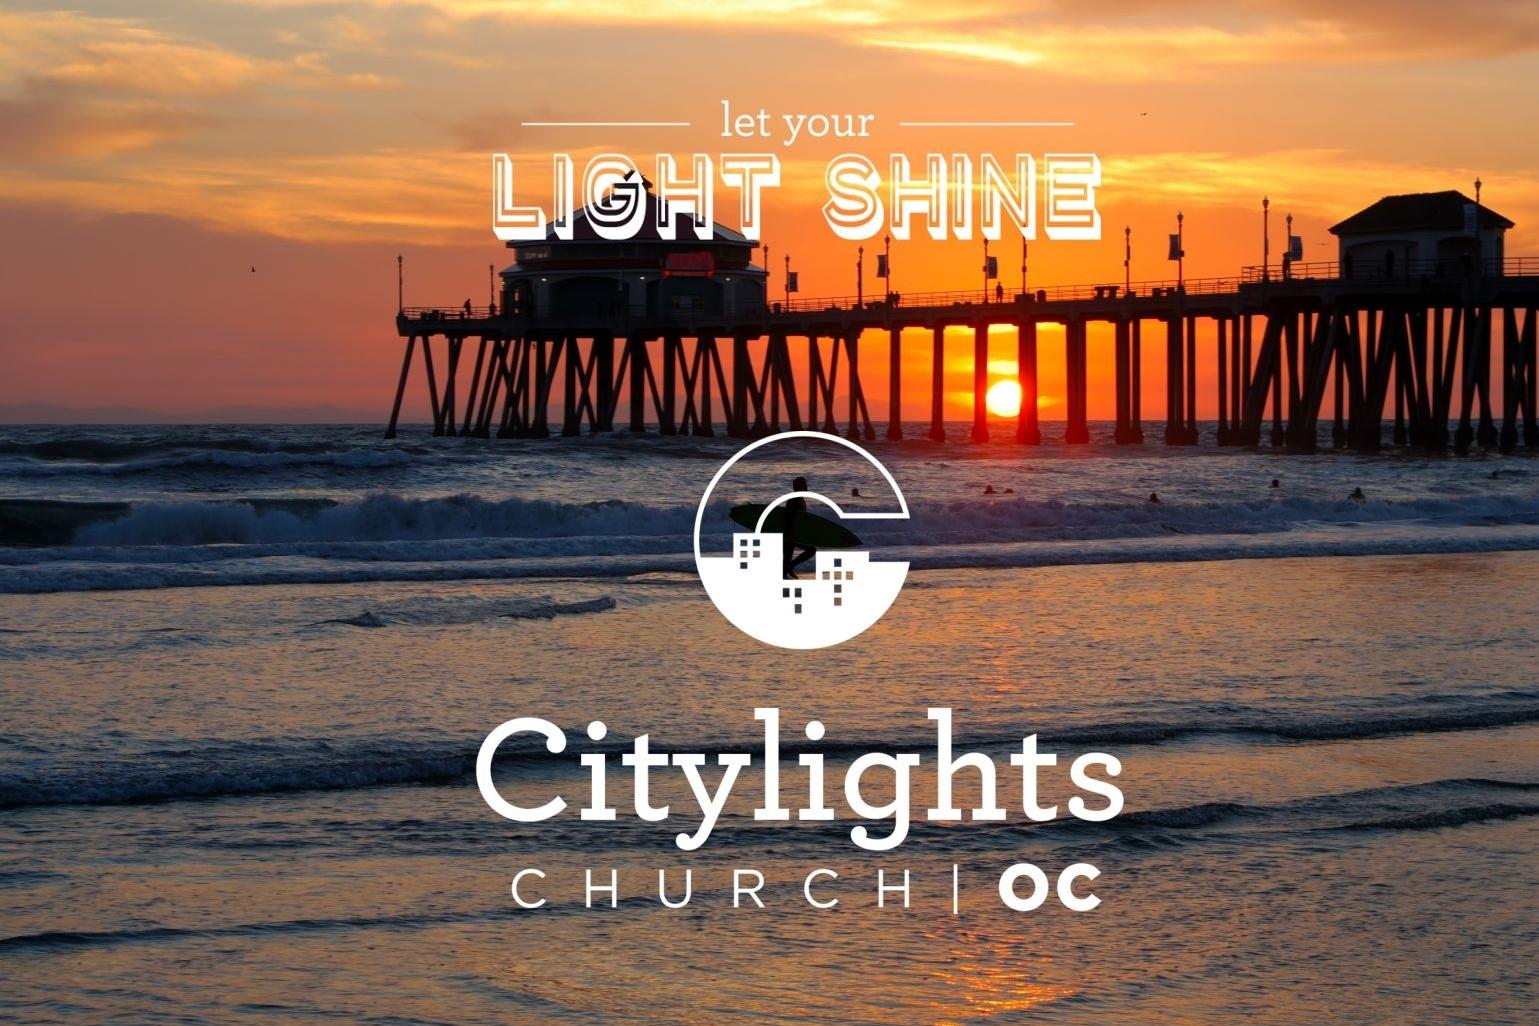 Citylights Farewell - 4x6 - Let Your Light Shine.jpg